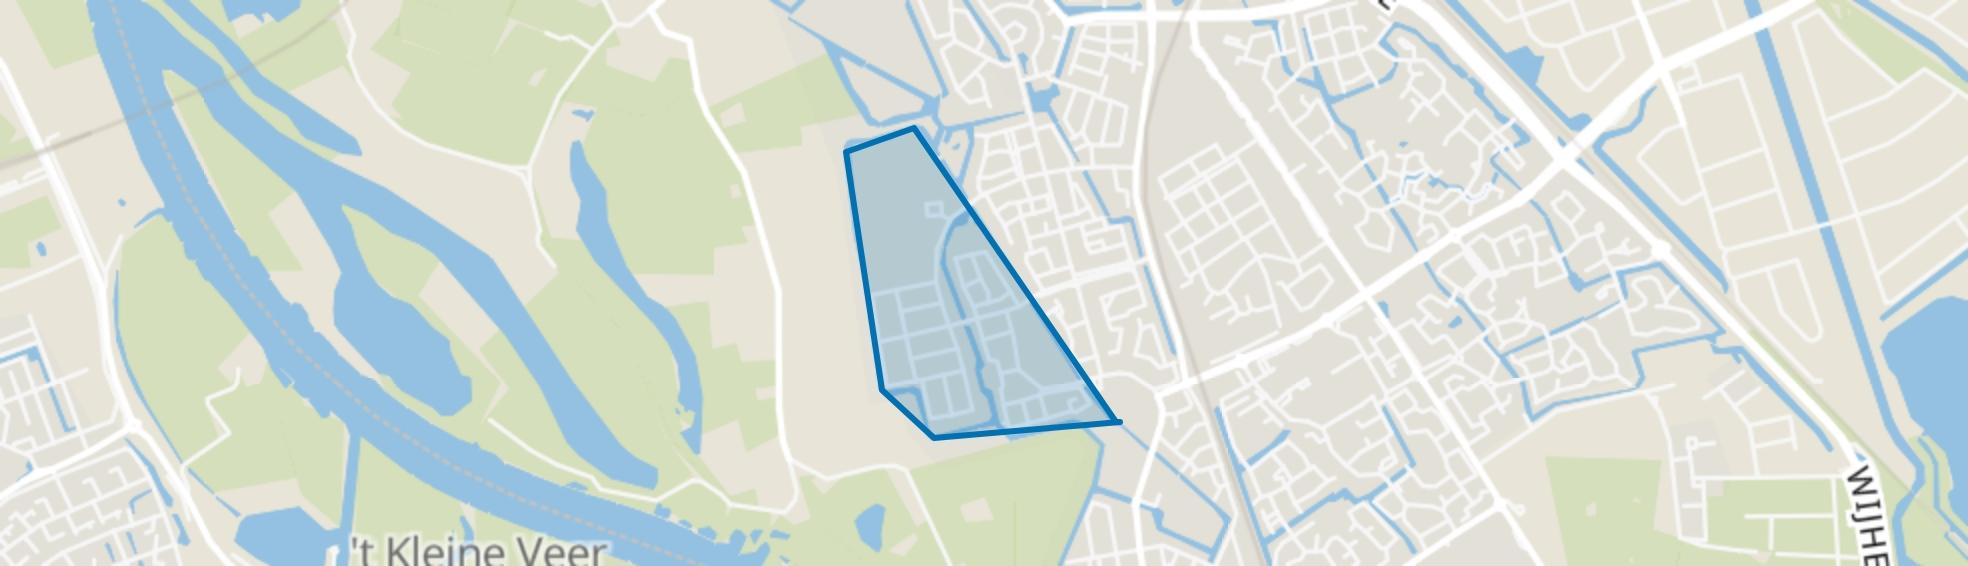 Oldenelerlanden-West, Zwolle map